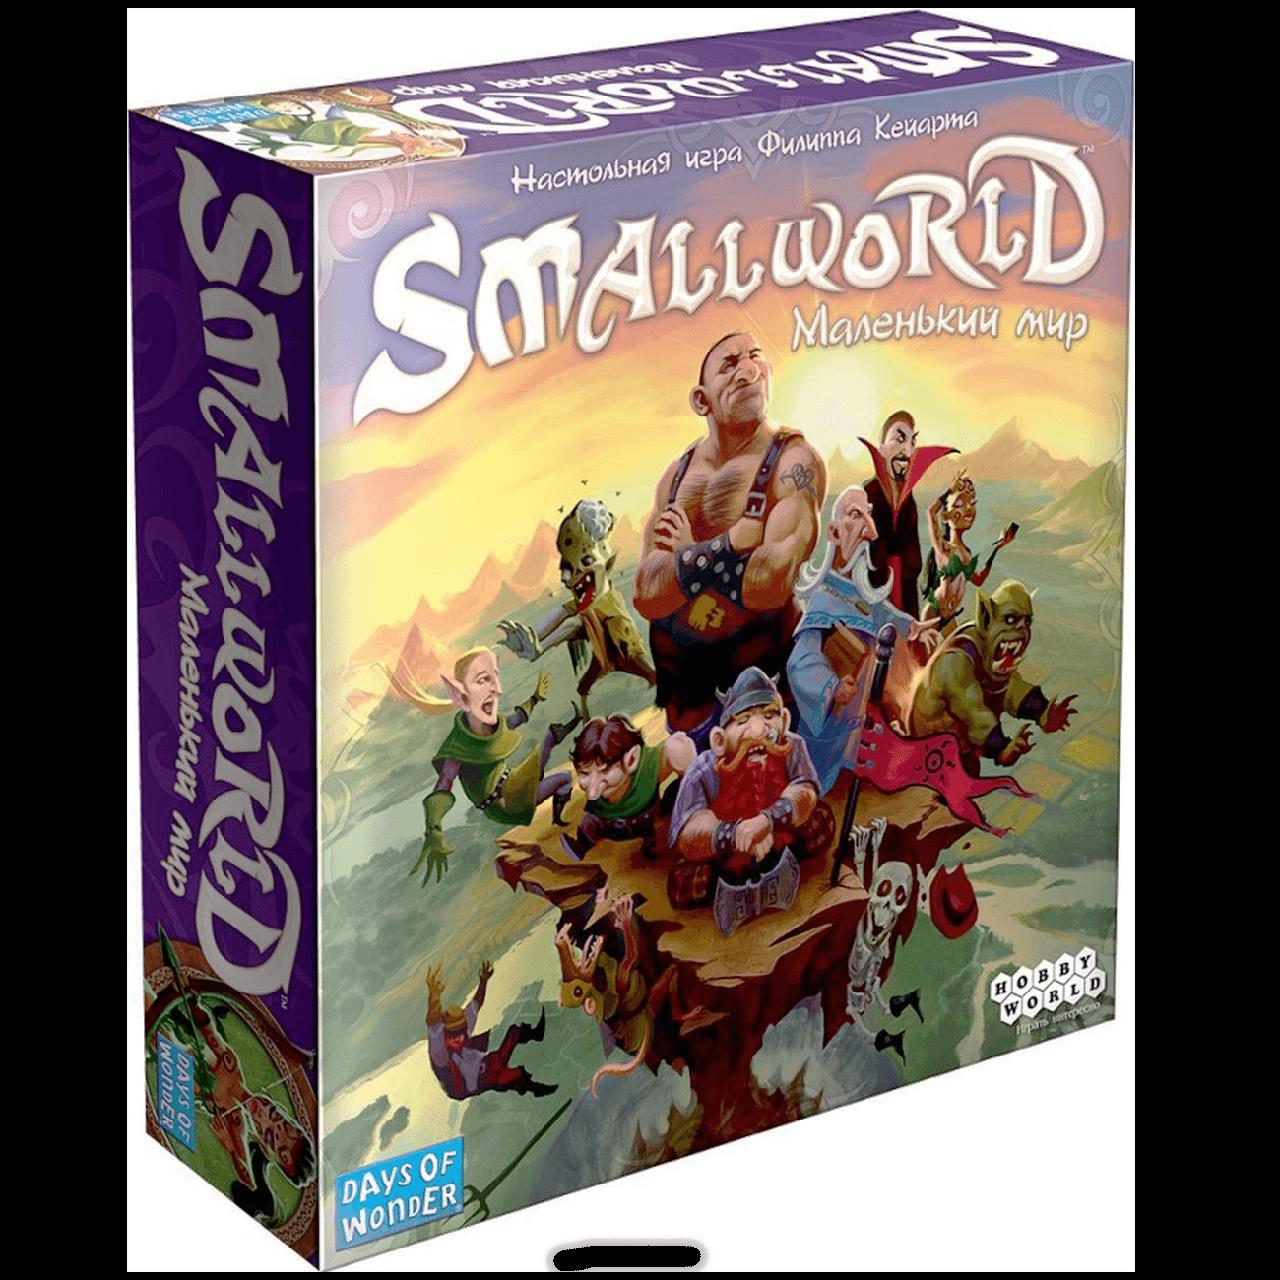 Small World: Маленький мир - фото 1